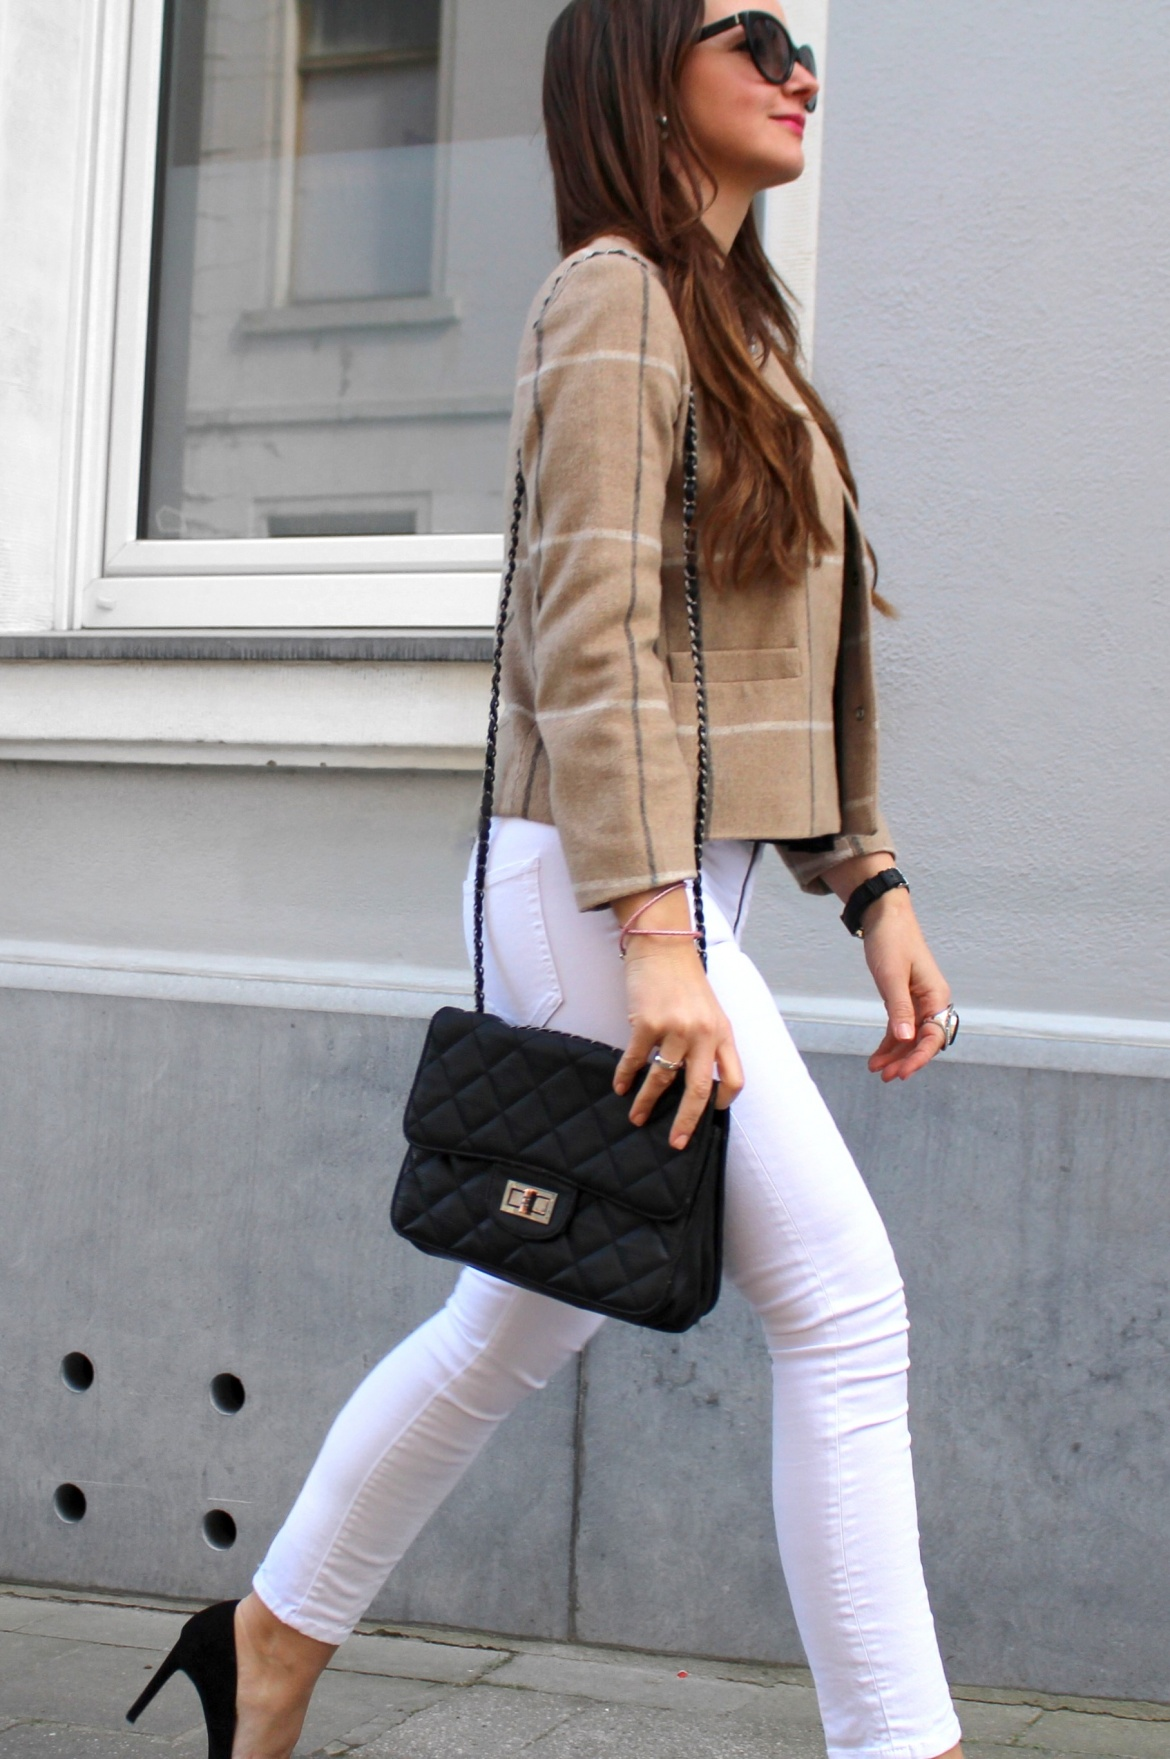 Fashioncircuz by Jenny img_3947a-1170x1759 CITY CHIC